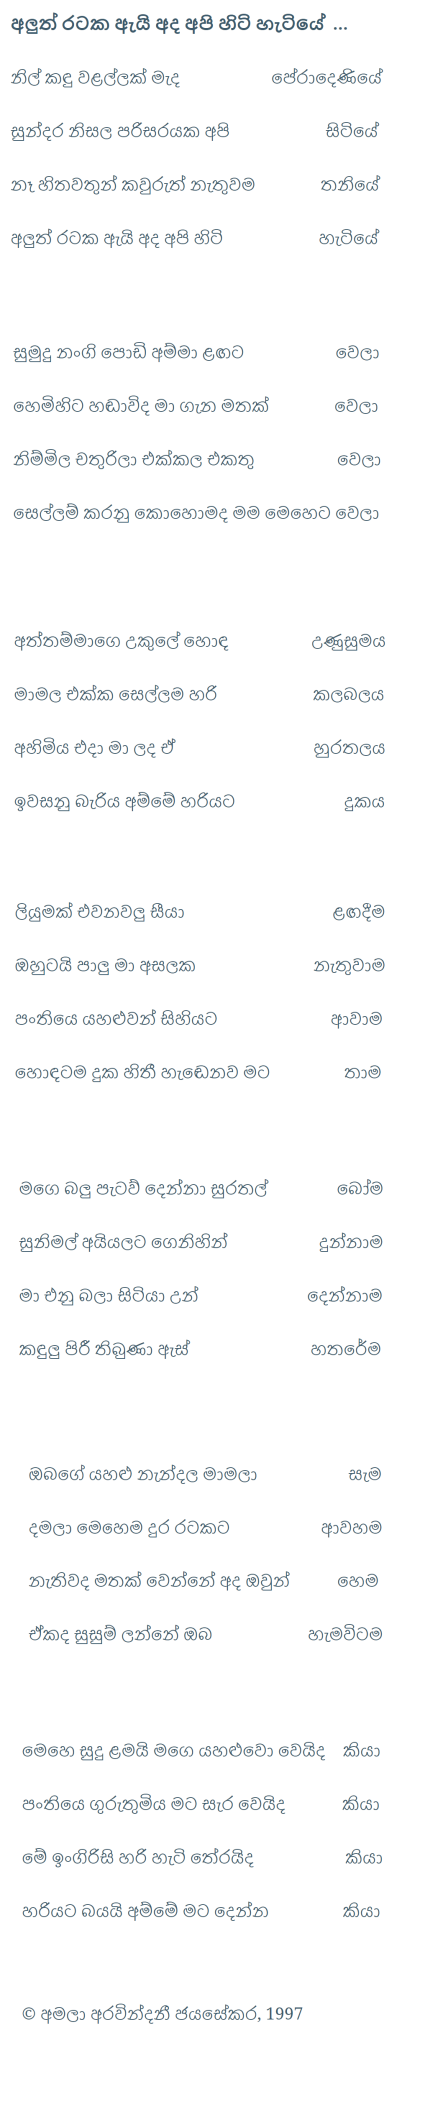 2018.10.14 - Amala Jayasekara - Mother, please tell me - Sinhala